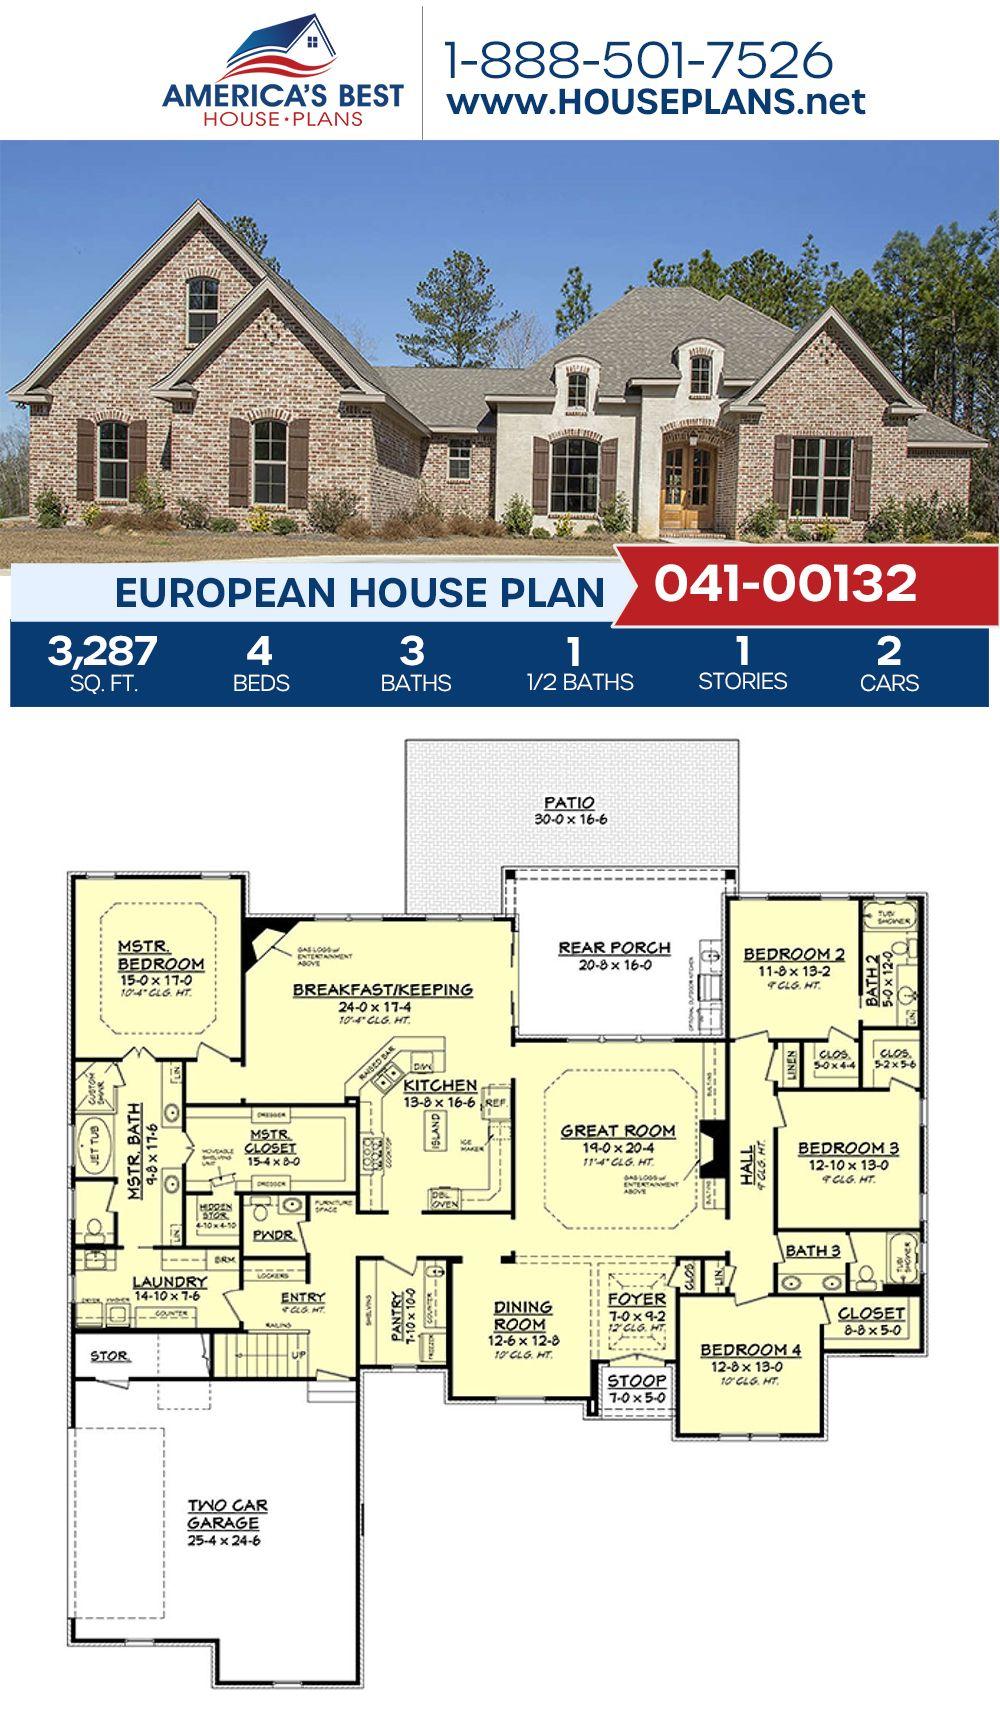 House Plan 041 00132 European Plan 3 287 Square Feet 4 Bedrooms 3 5 Bathrooms House Plans European Plan Dream House Plans